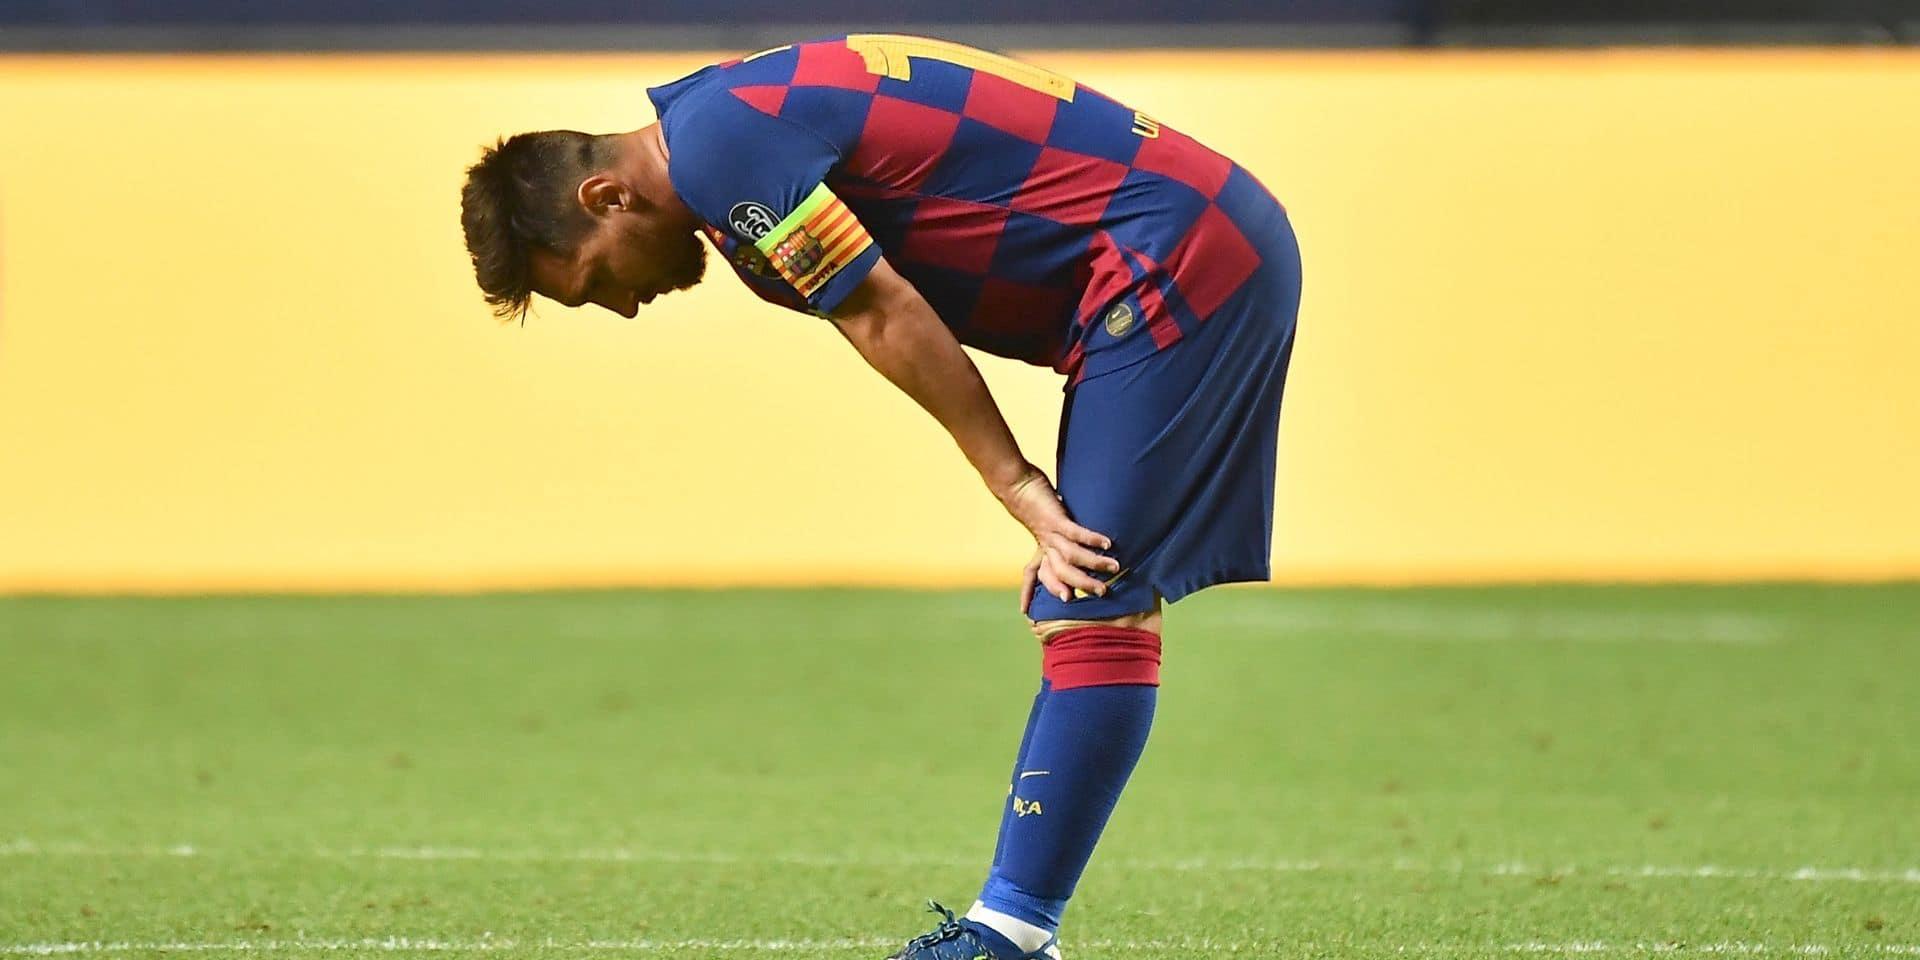 Journal du mercato (27/08): Lionel Messi aurait choisi Manchester City !